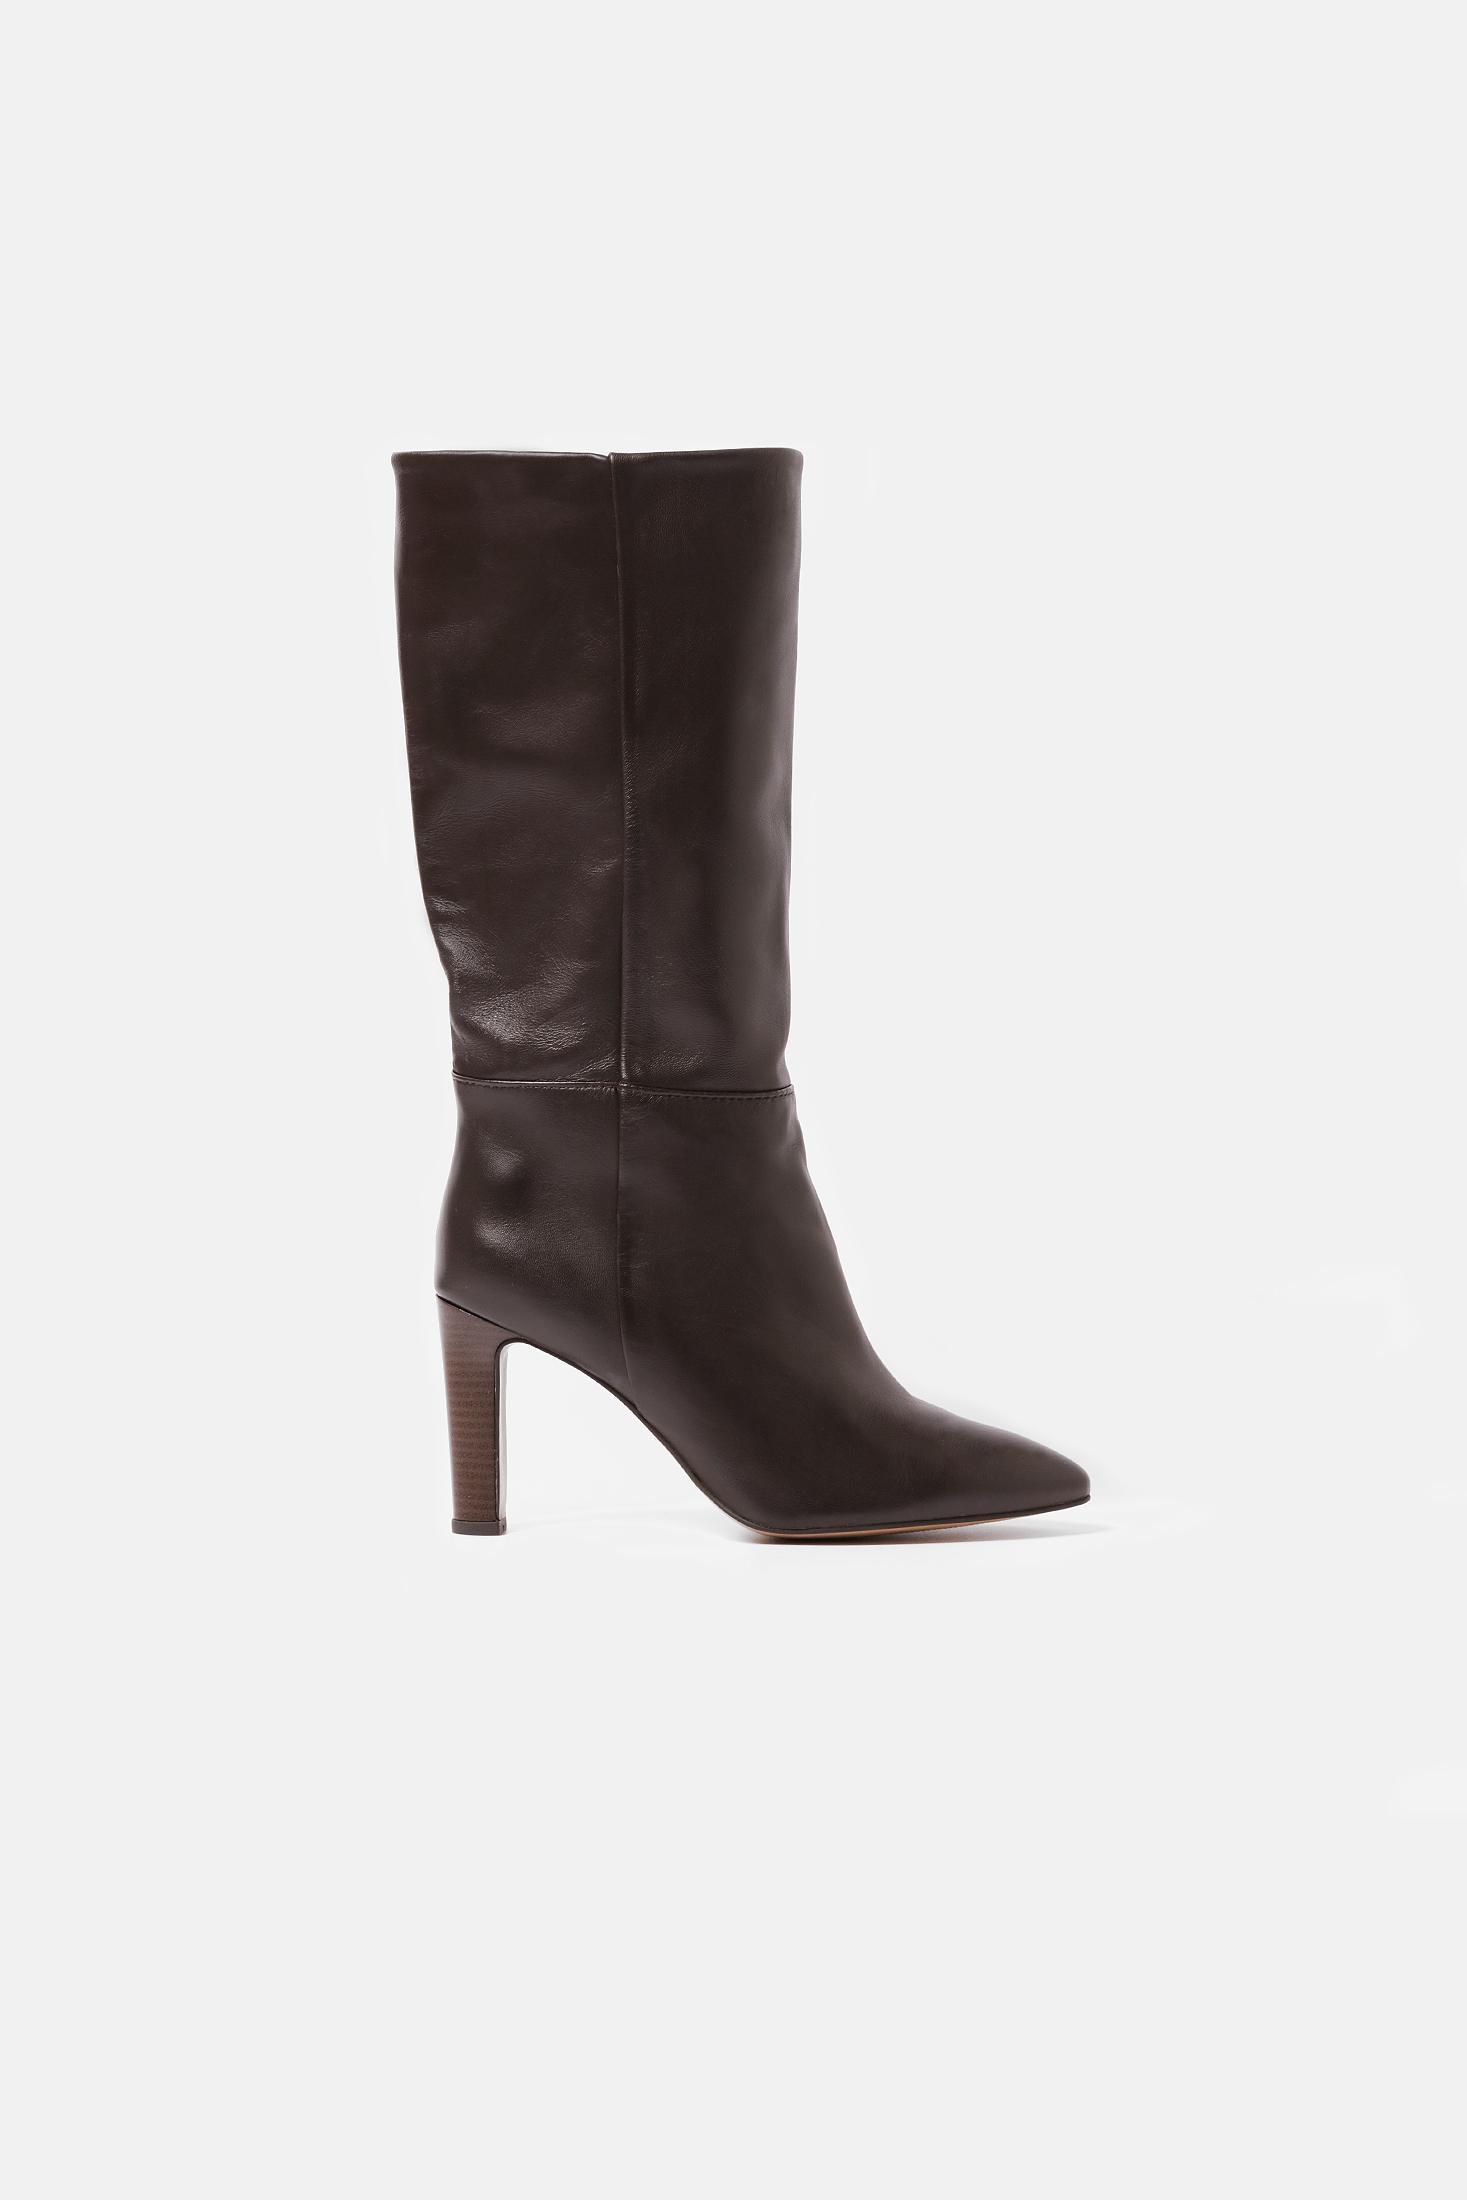 buty damskie NAPPI